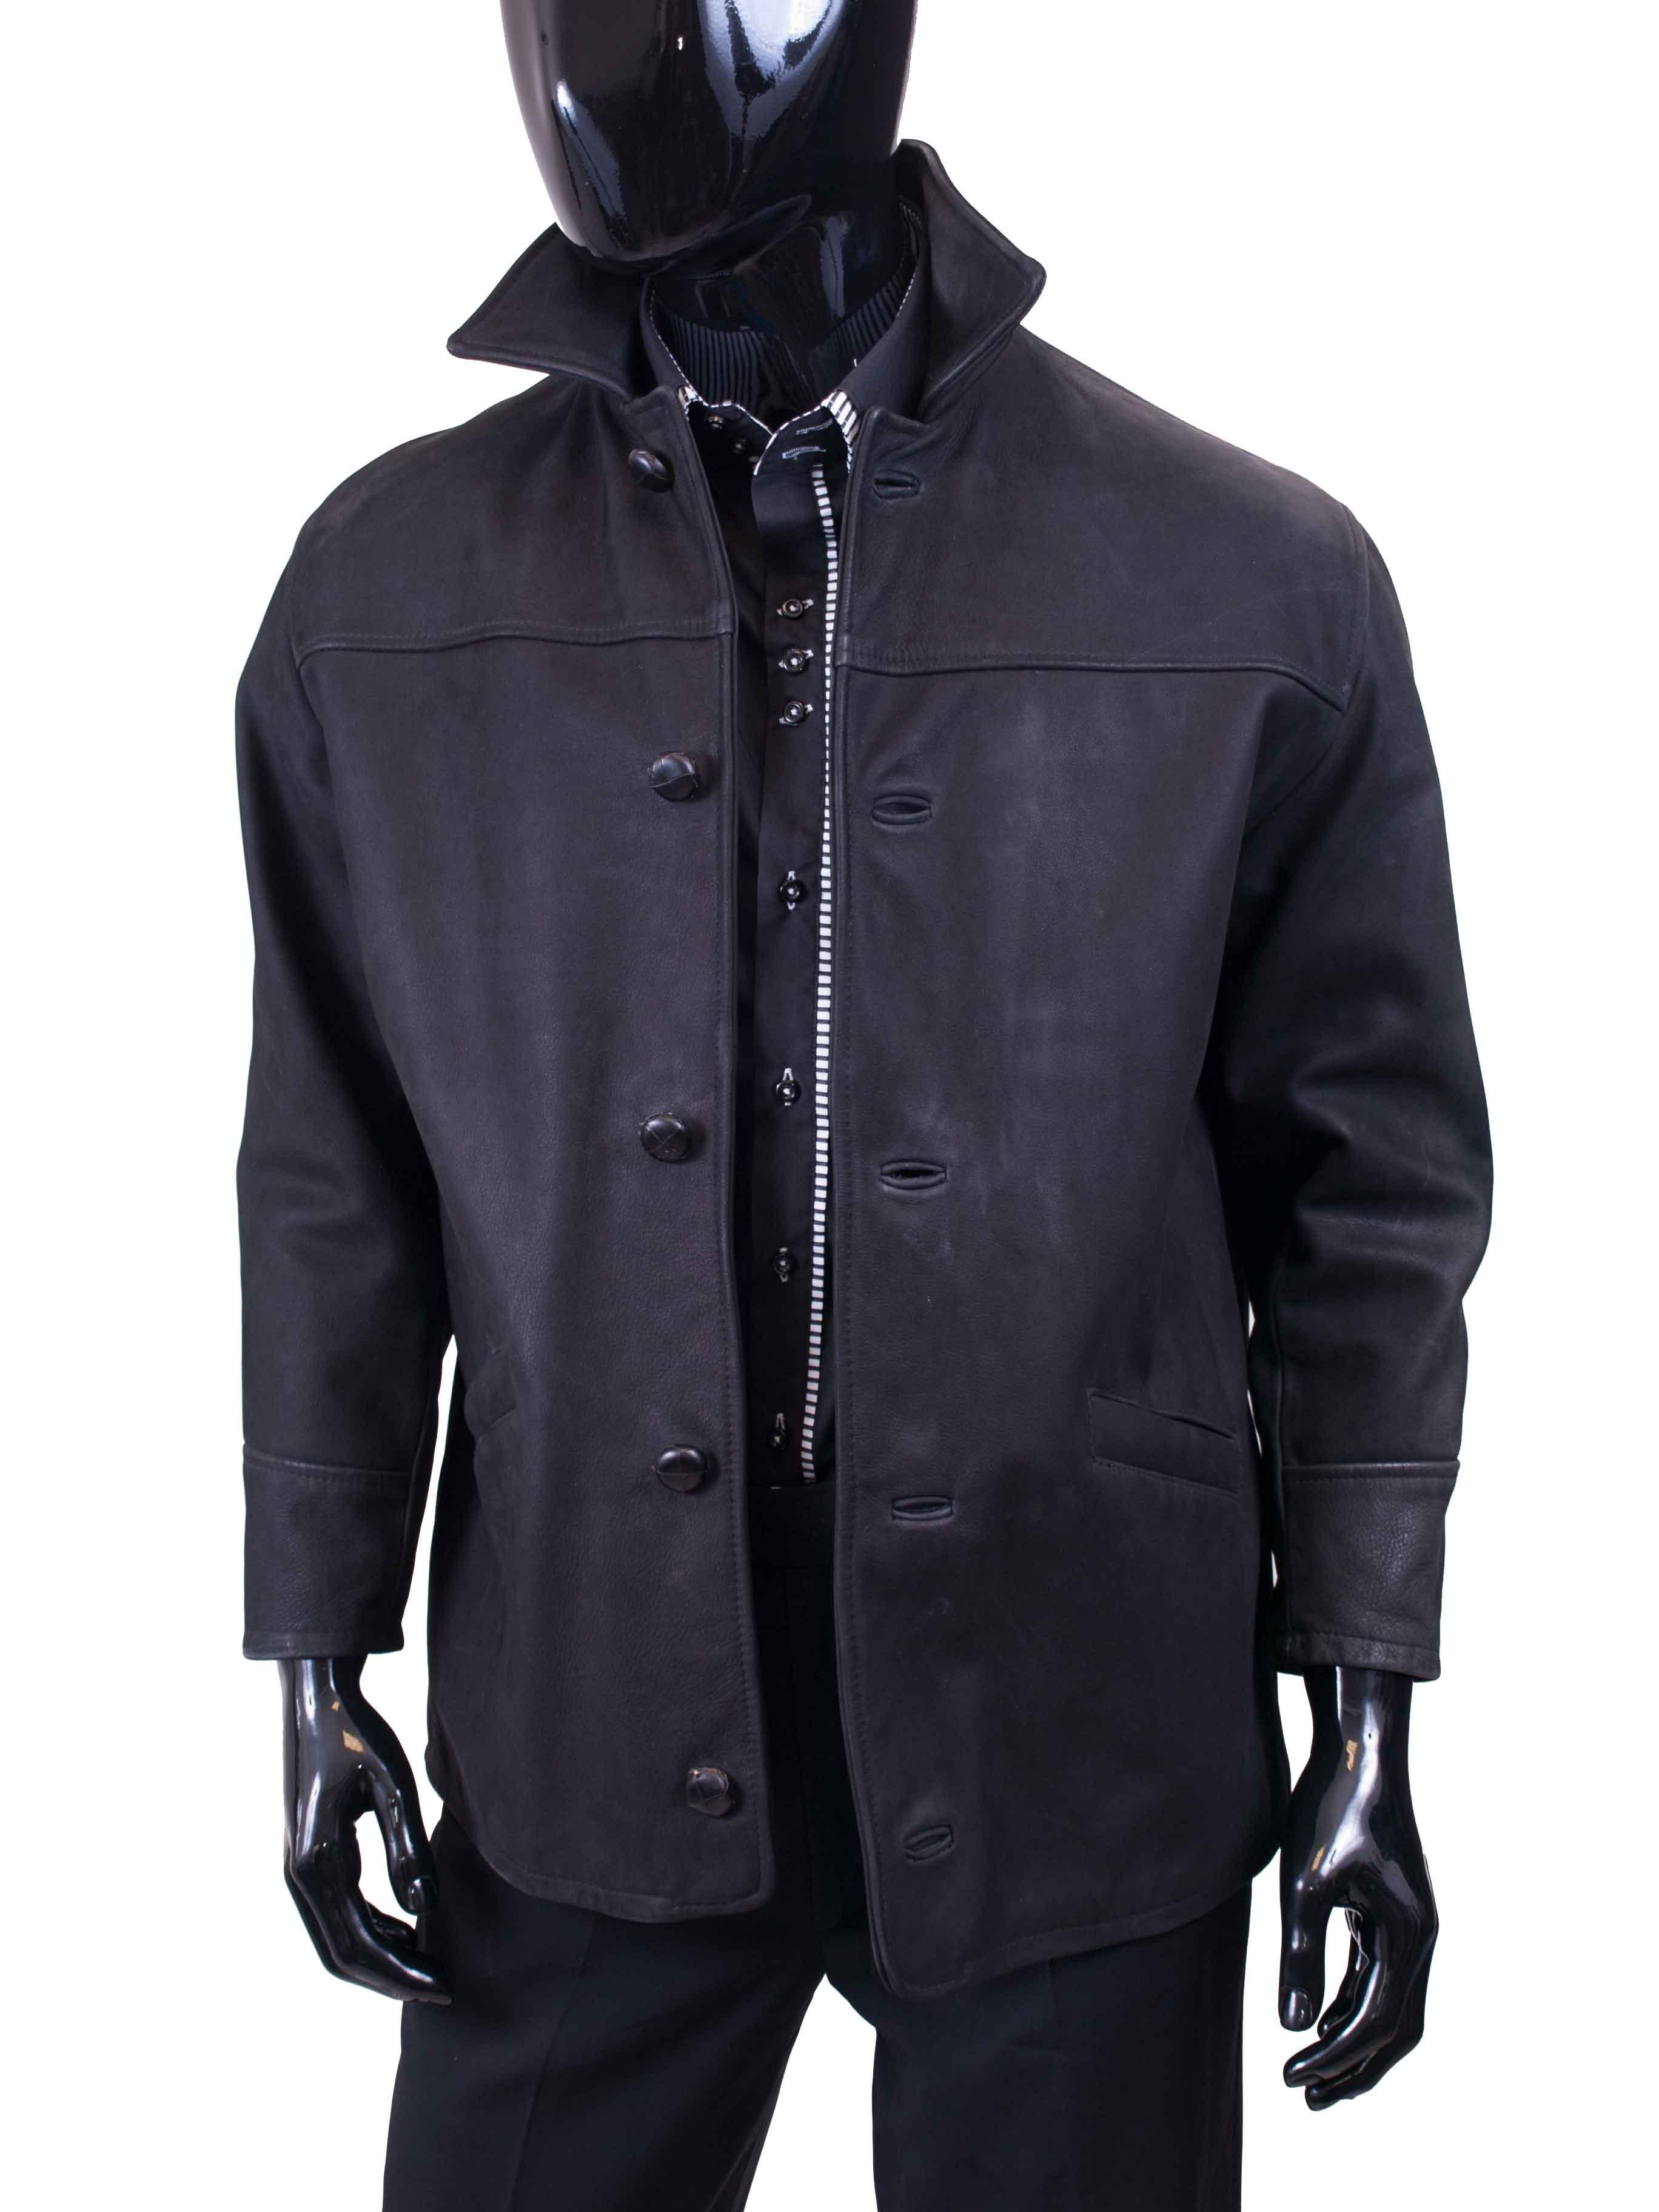 Pánská kožená bunda (kabát) černá